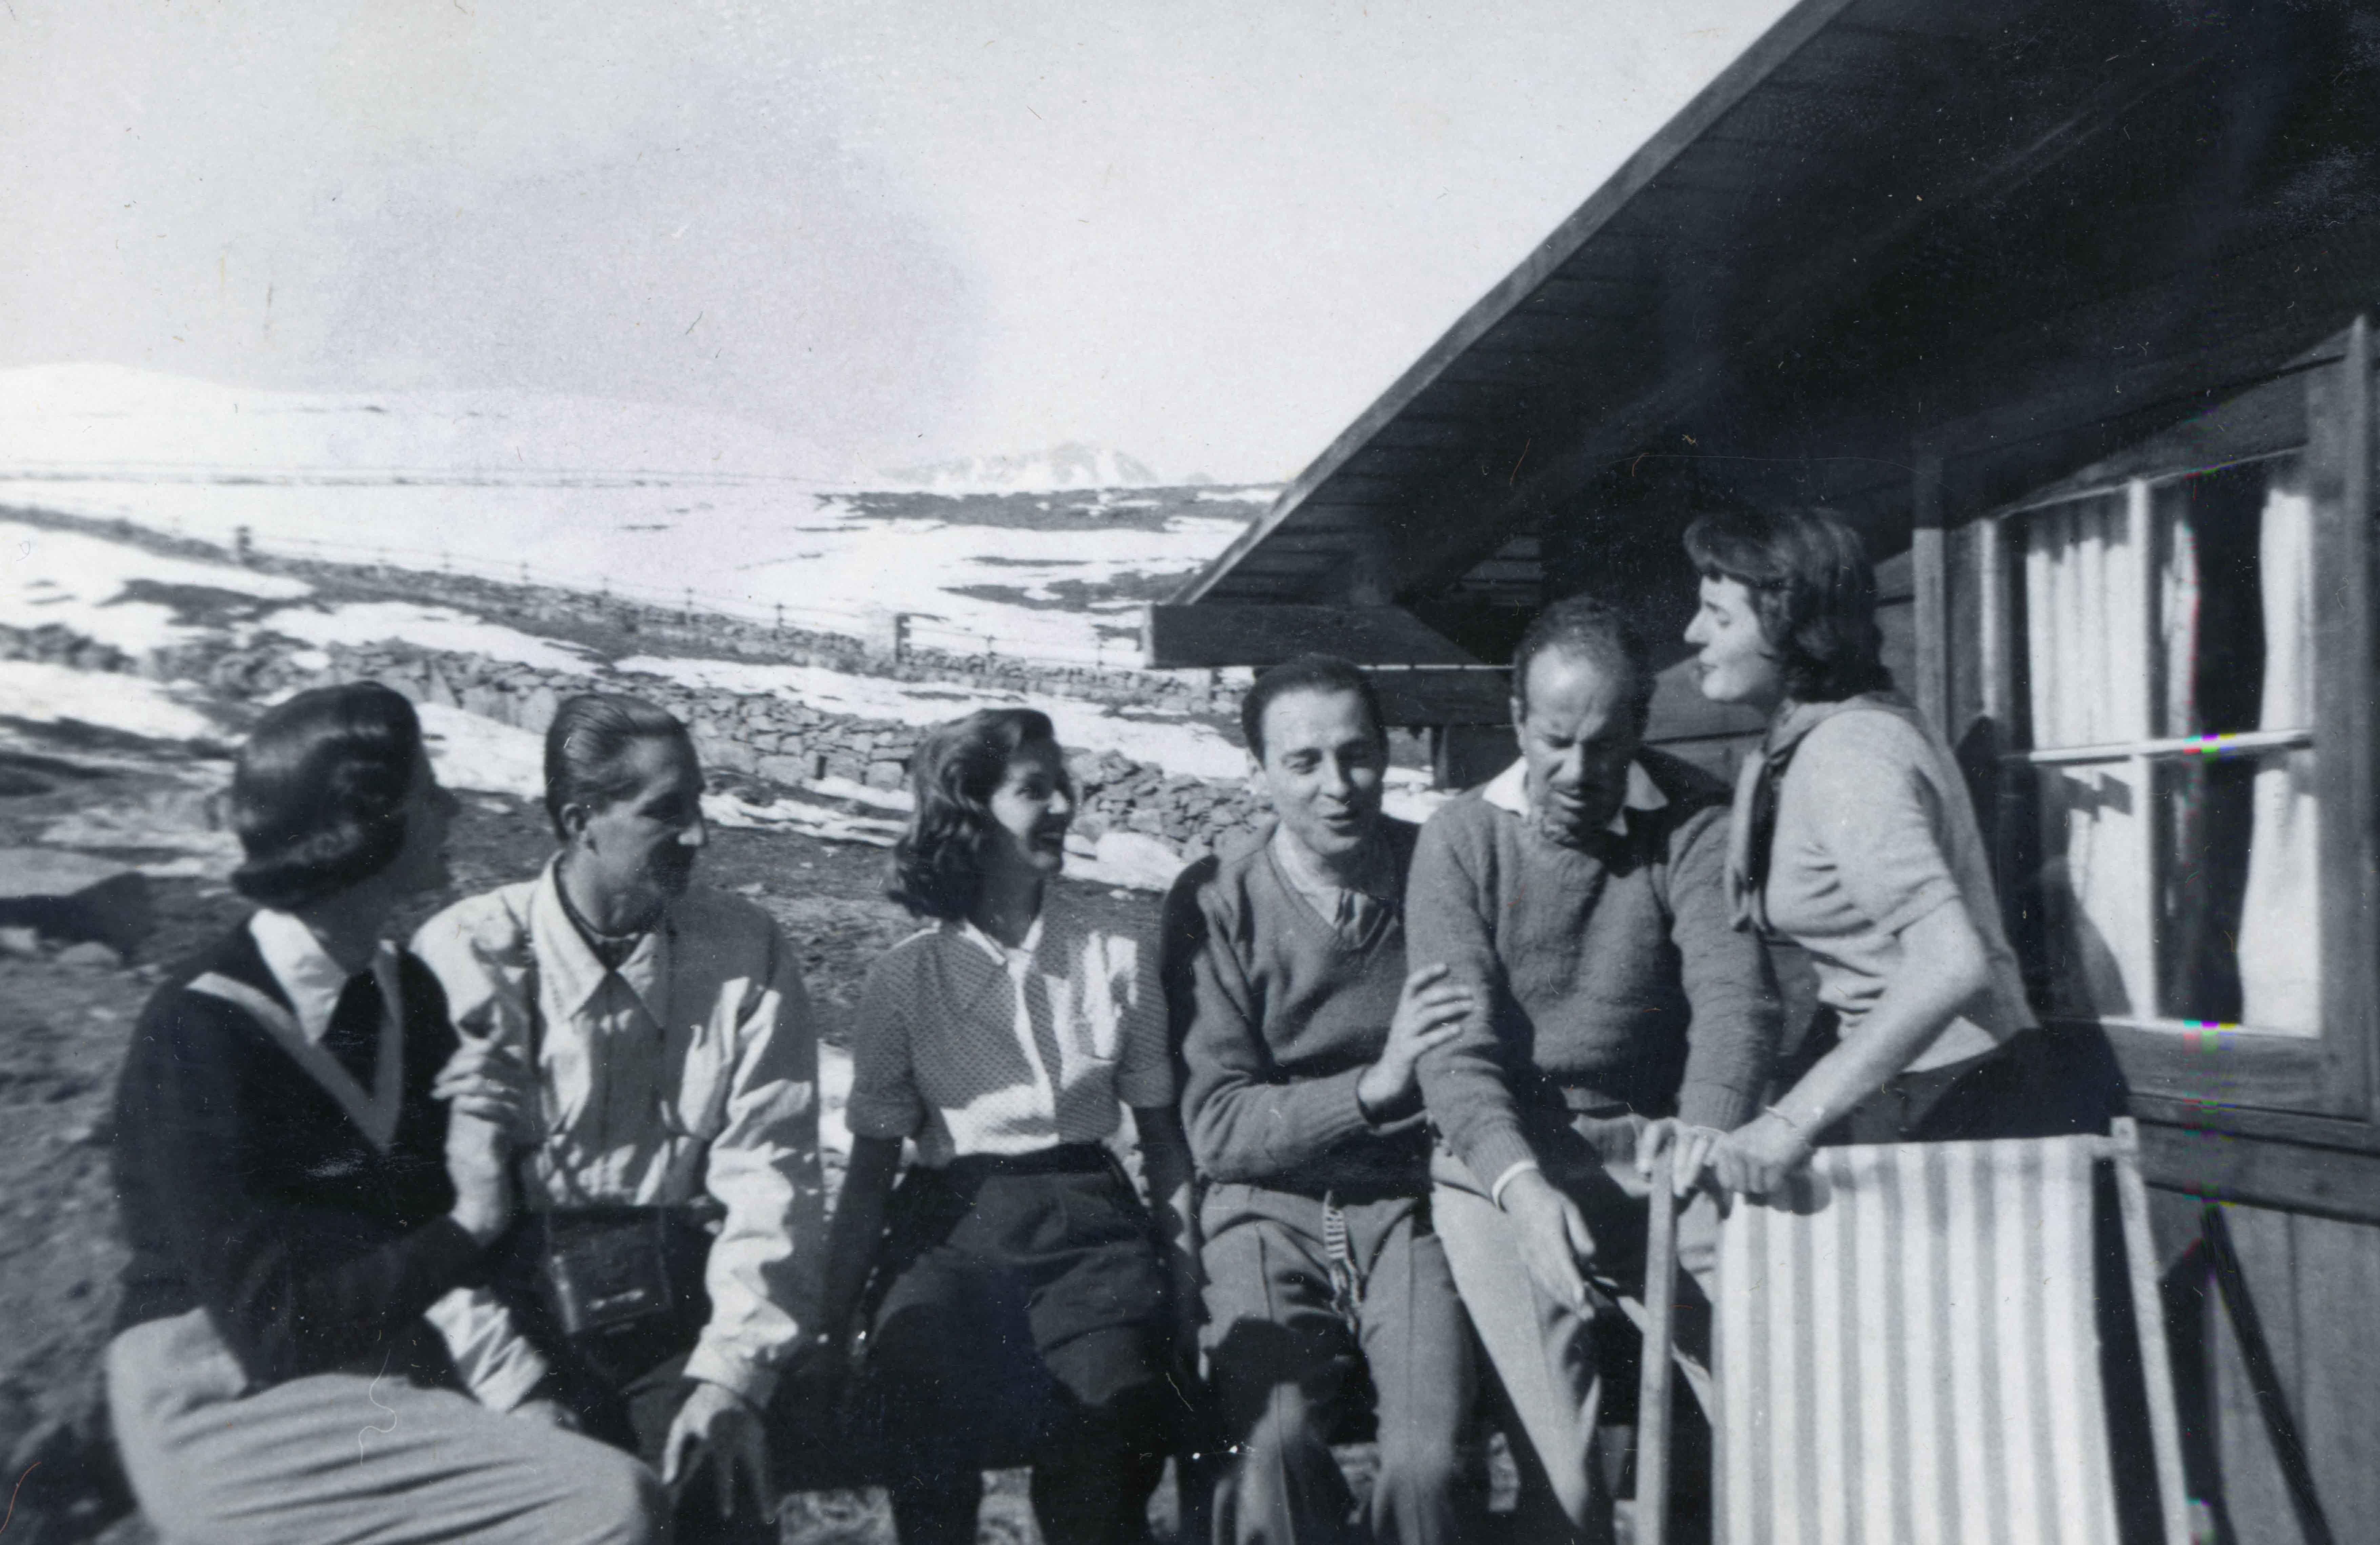 Enterreno - Fotos históricas de chile - fotos antiguas de Chile - Farellones en 1950